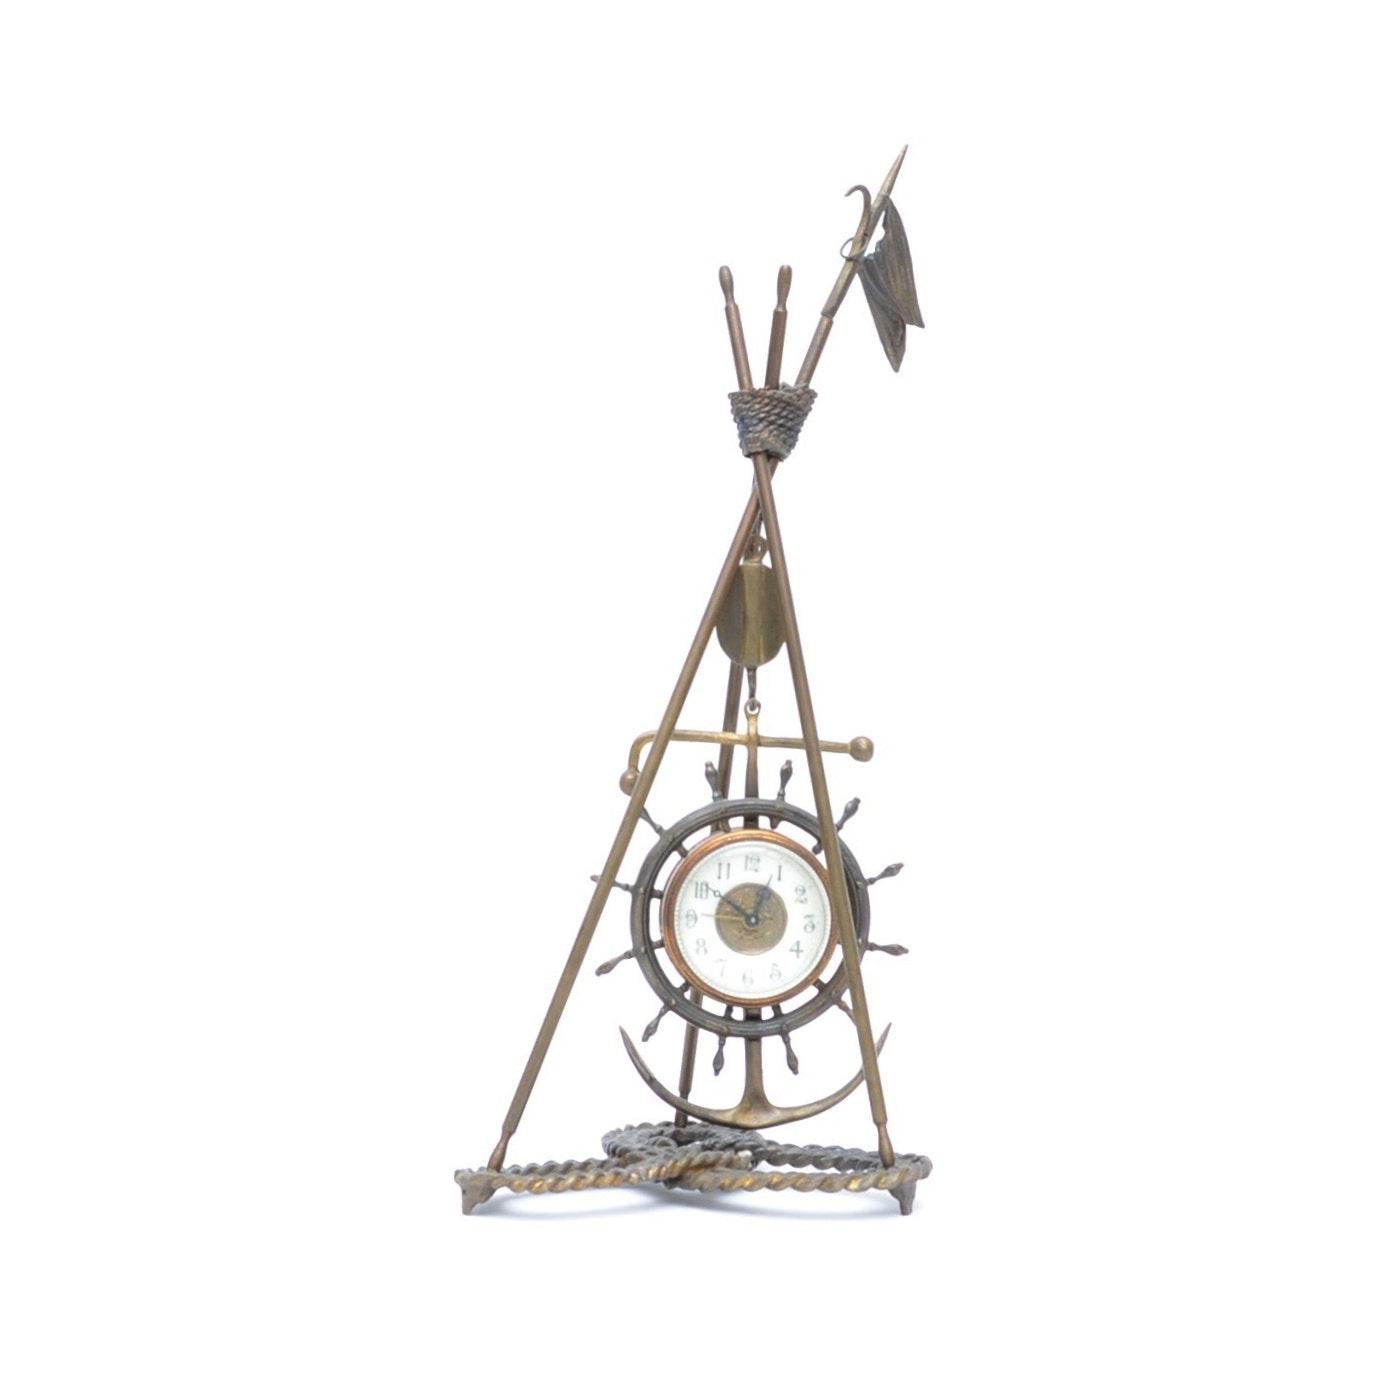 Cast Brass Navy Ship's Wheel Pendulum Clock